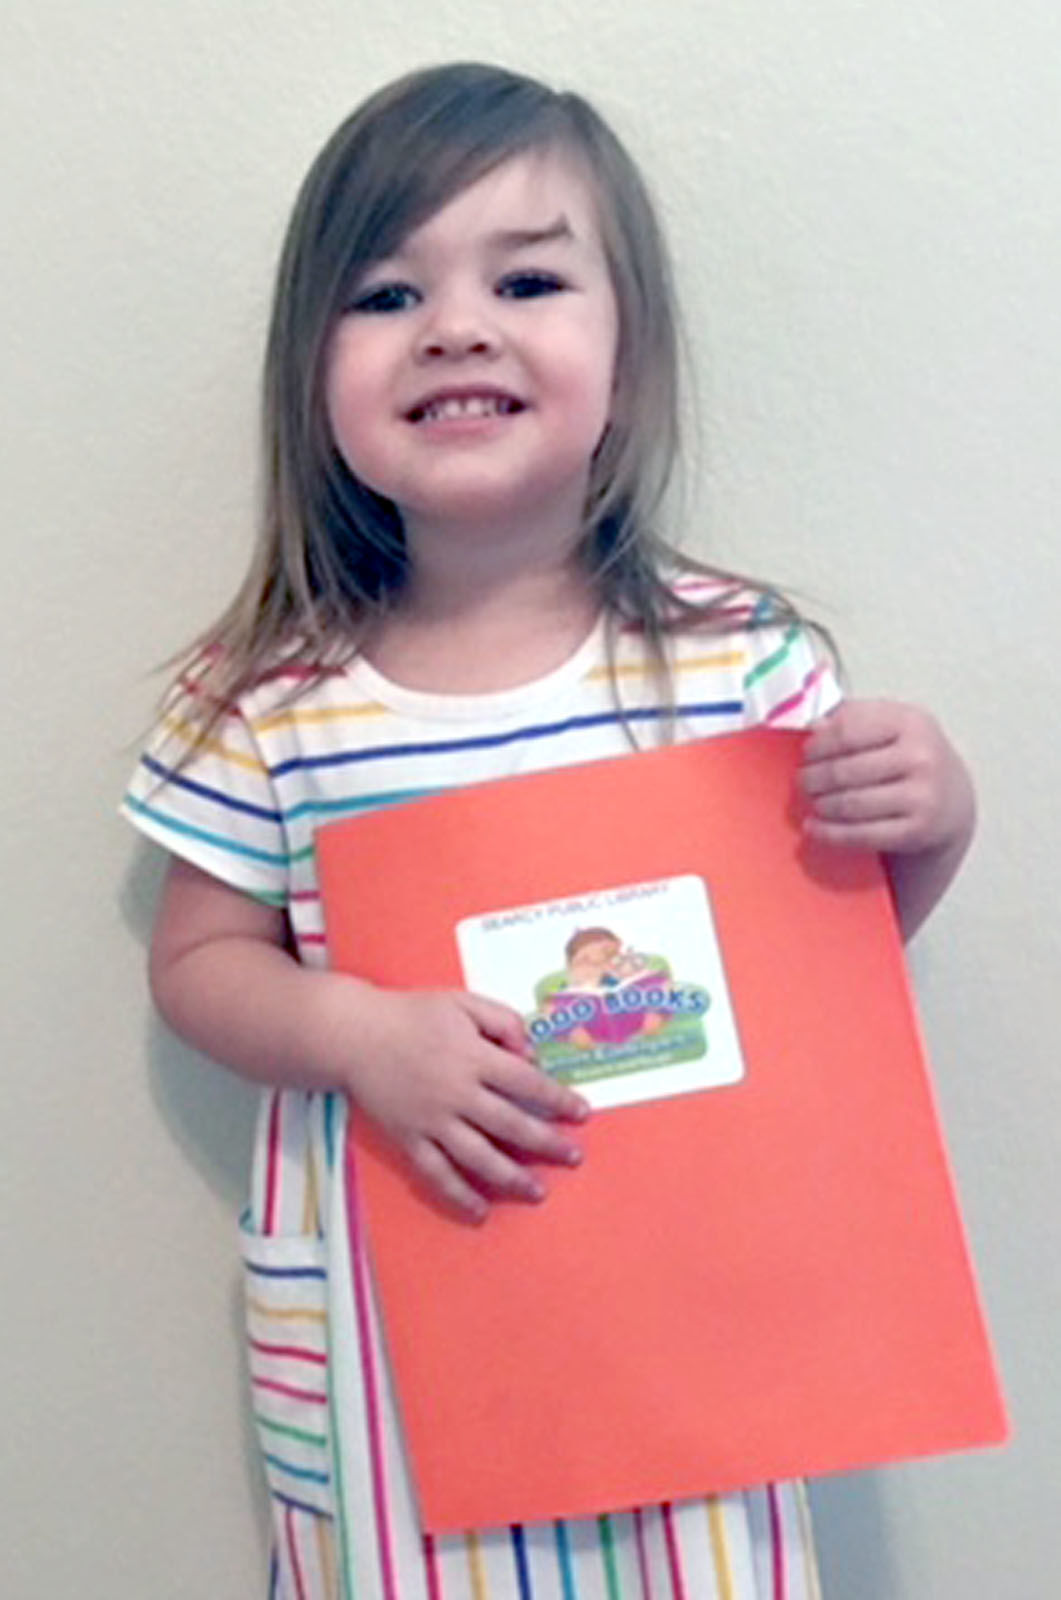 Two complete 1,000 Books Before Kindergarten